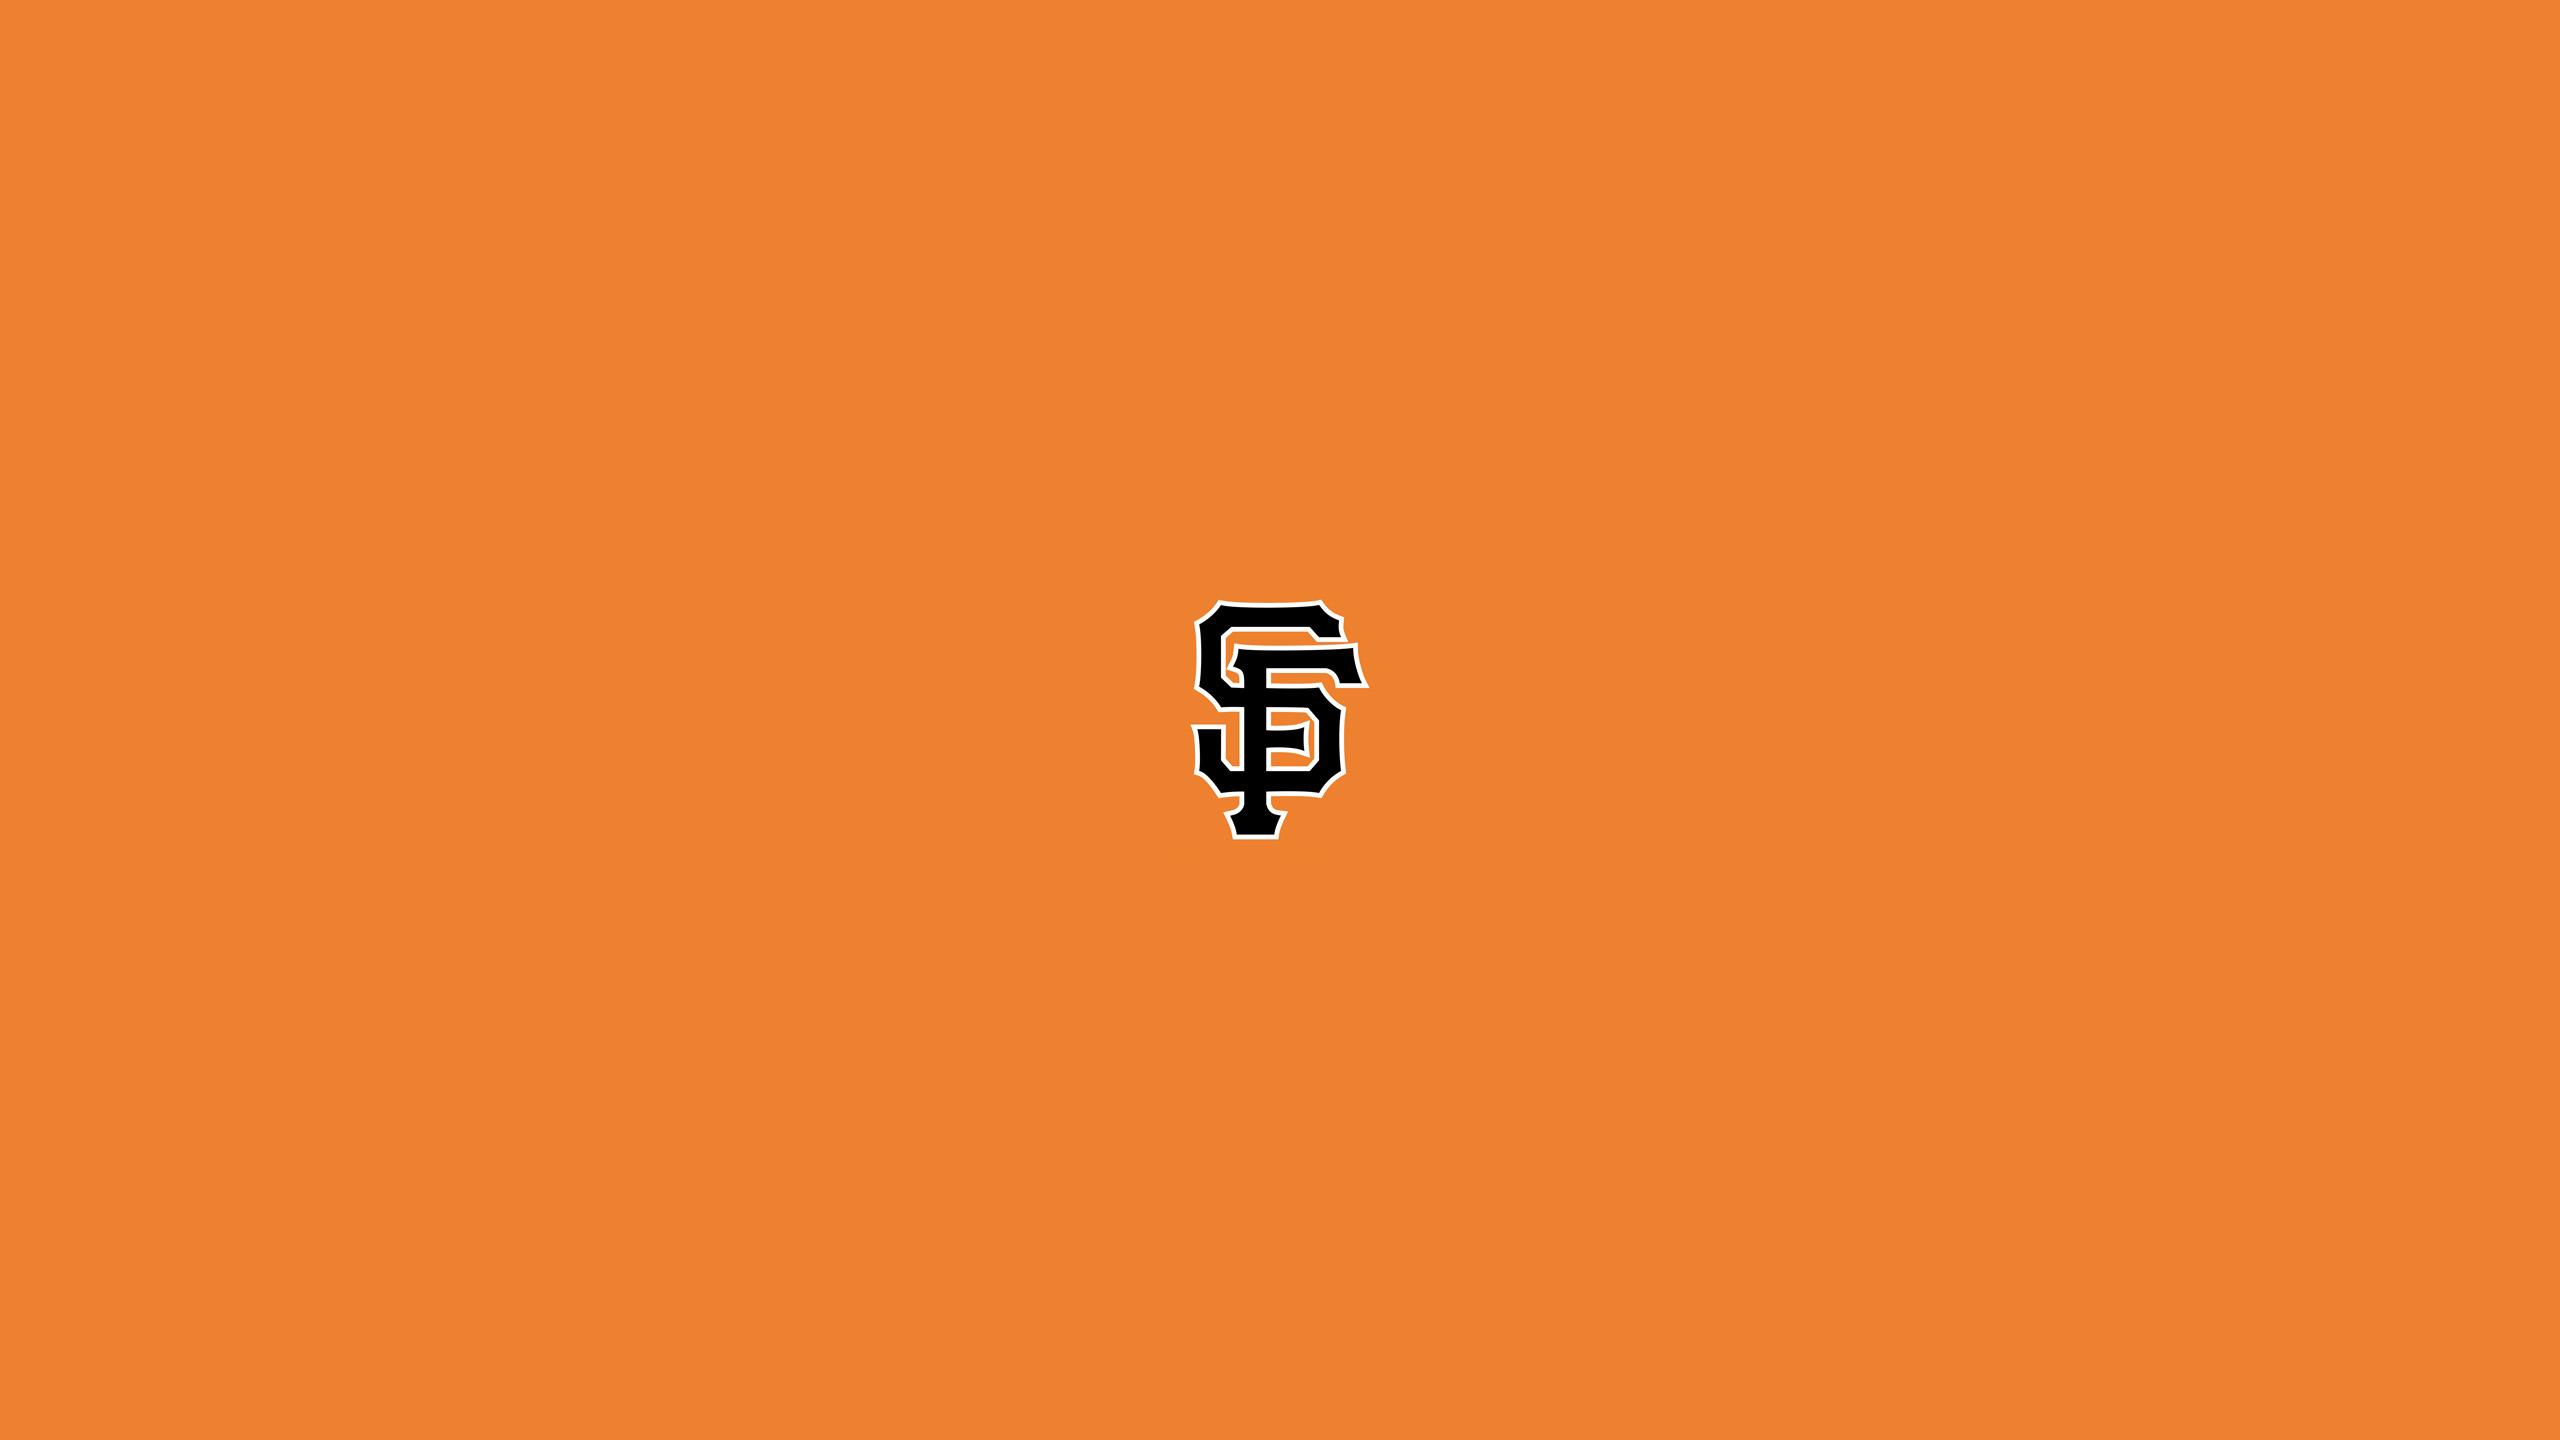 SF Giants wallpaper 2560x1440 54192 2560x1440